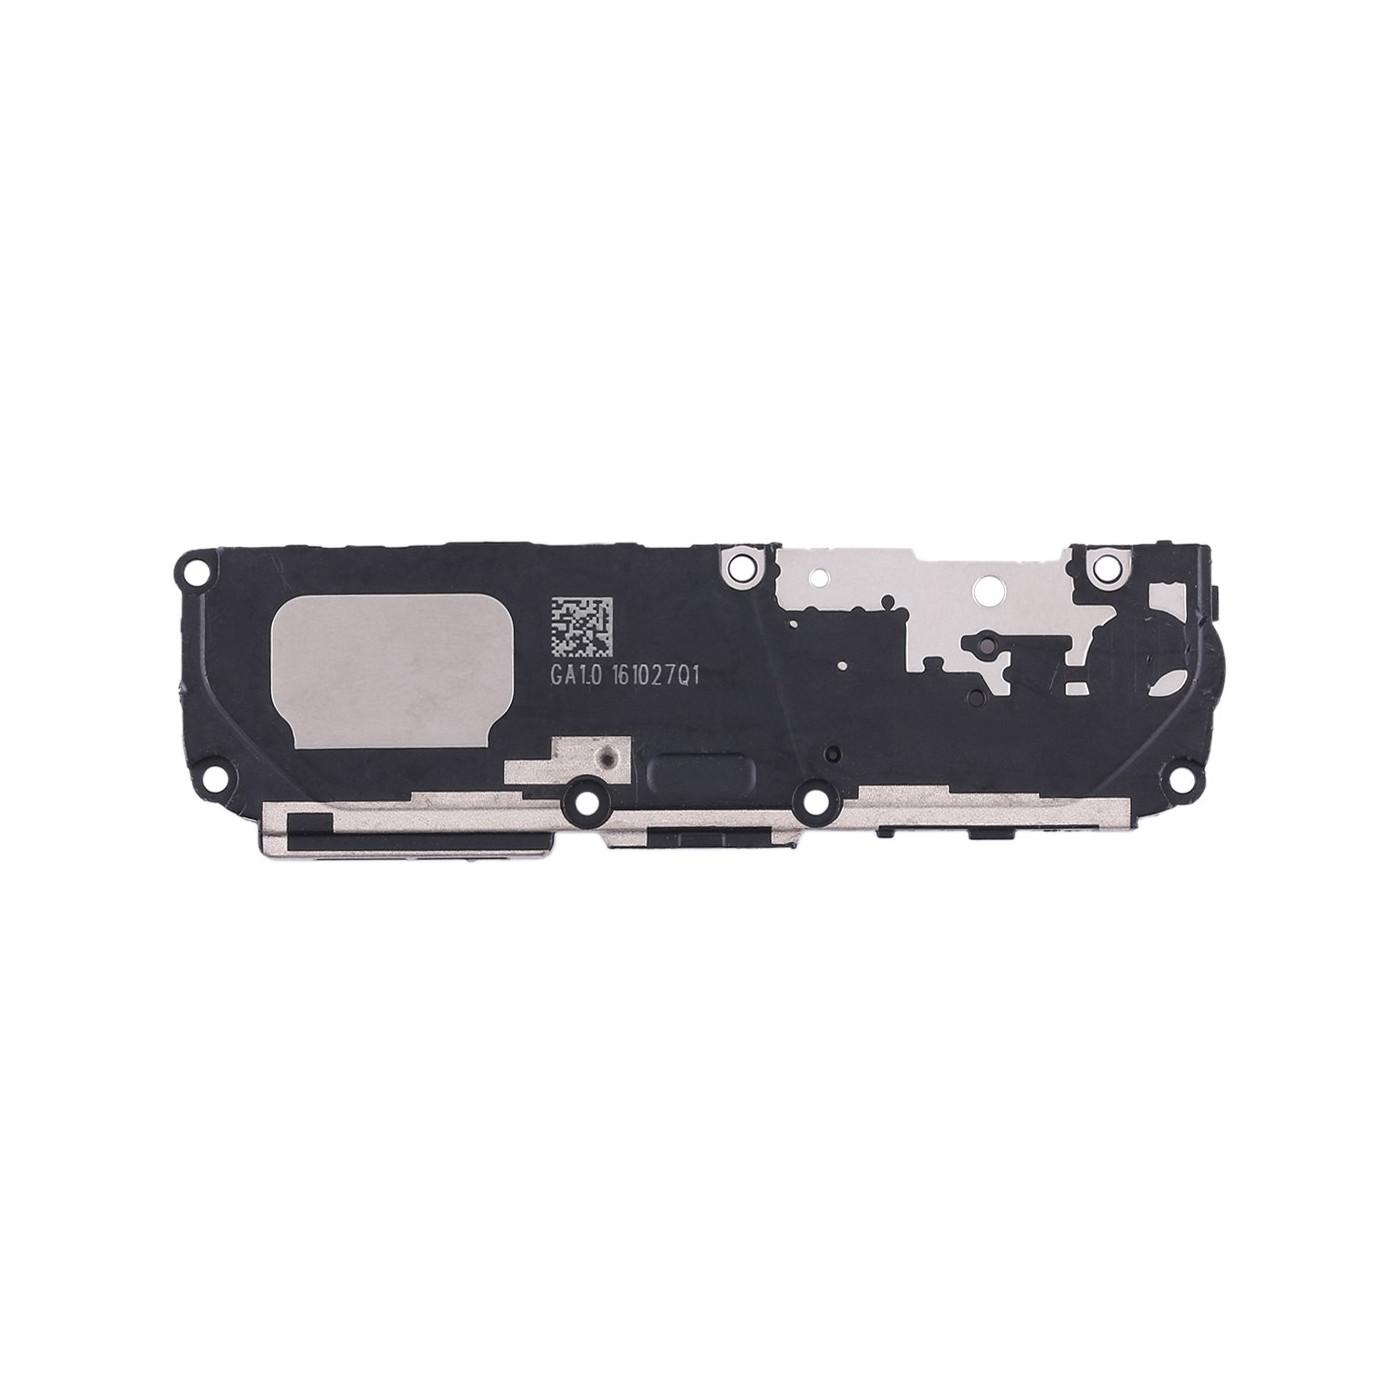 Altavoz con altavoz Altavoz con altavoz Huawei P8 Lite 2017